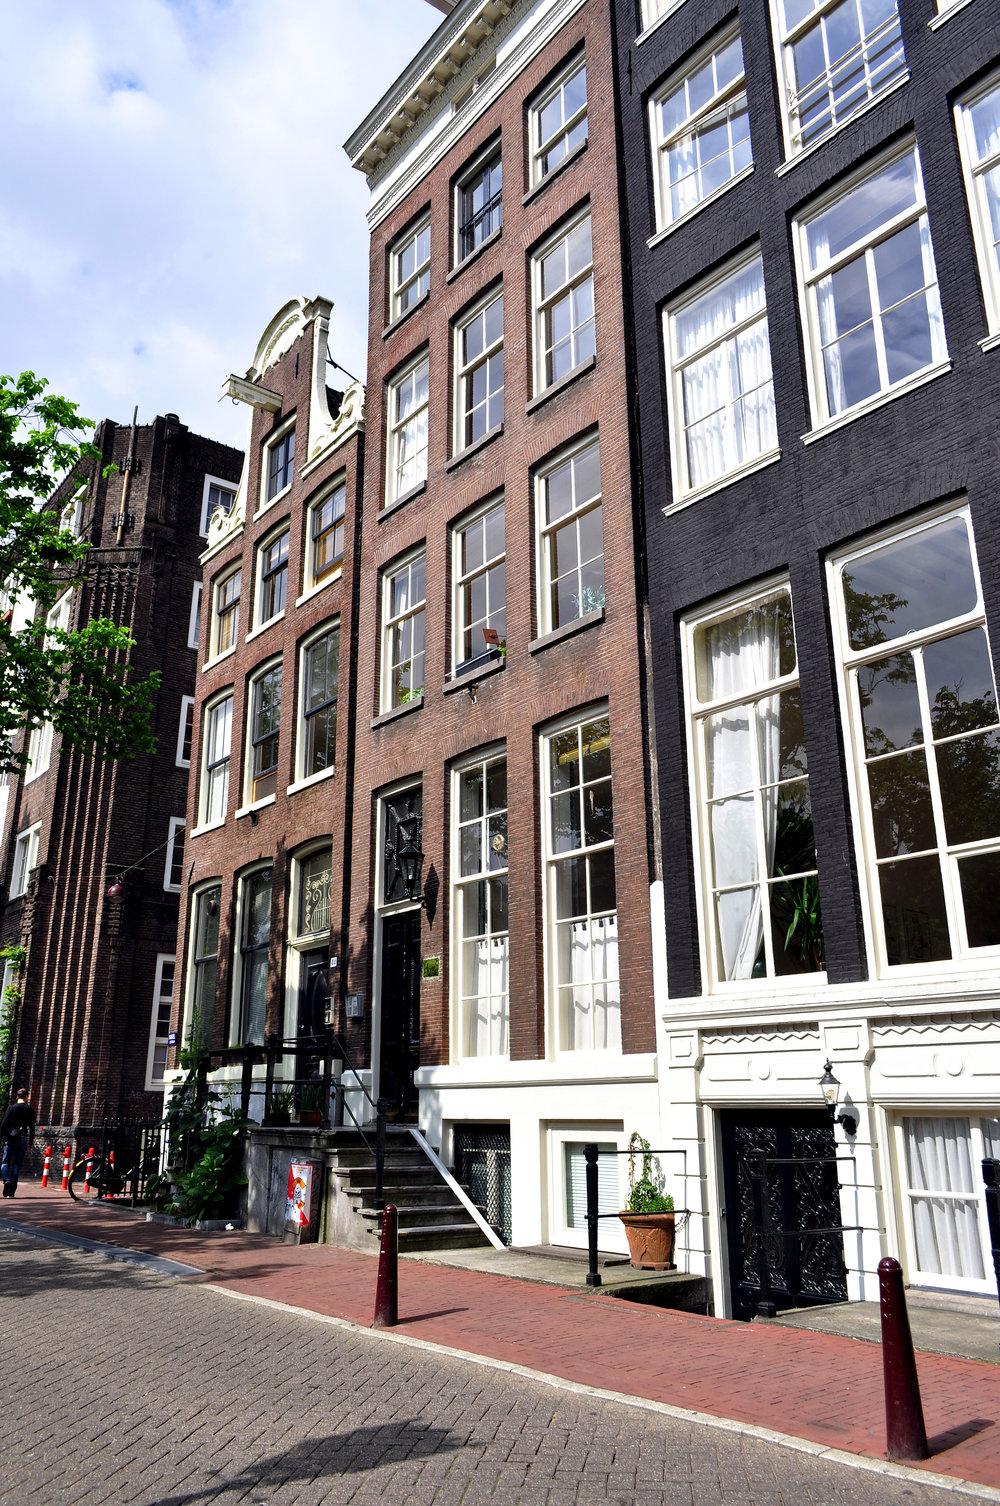 Calles de Amsterdam 3.JPG